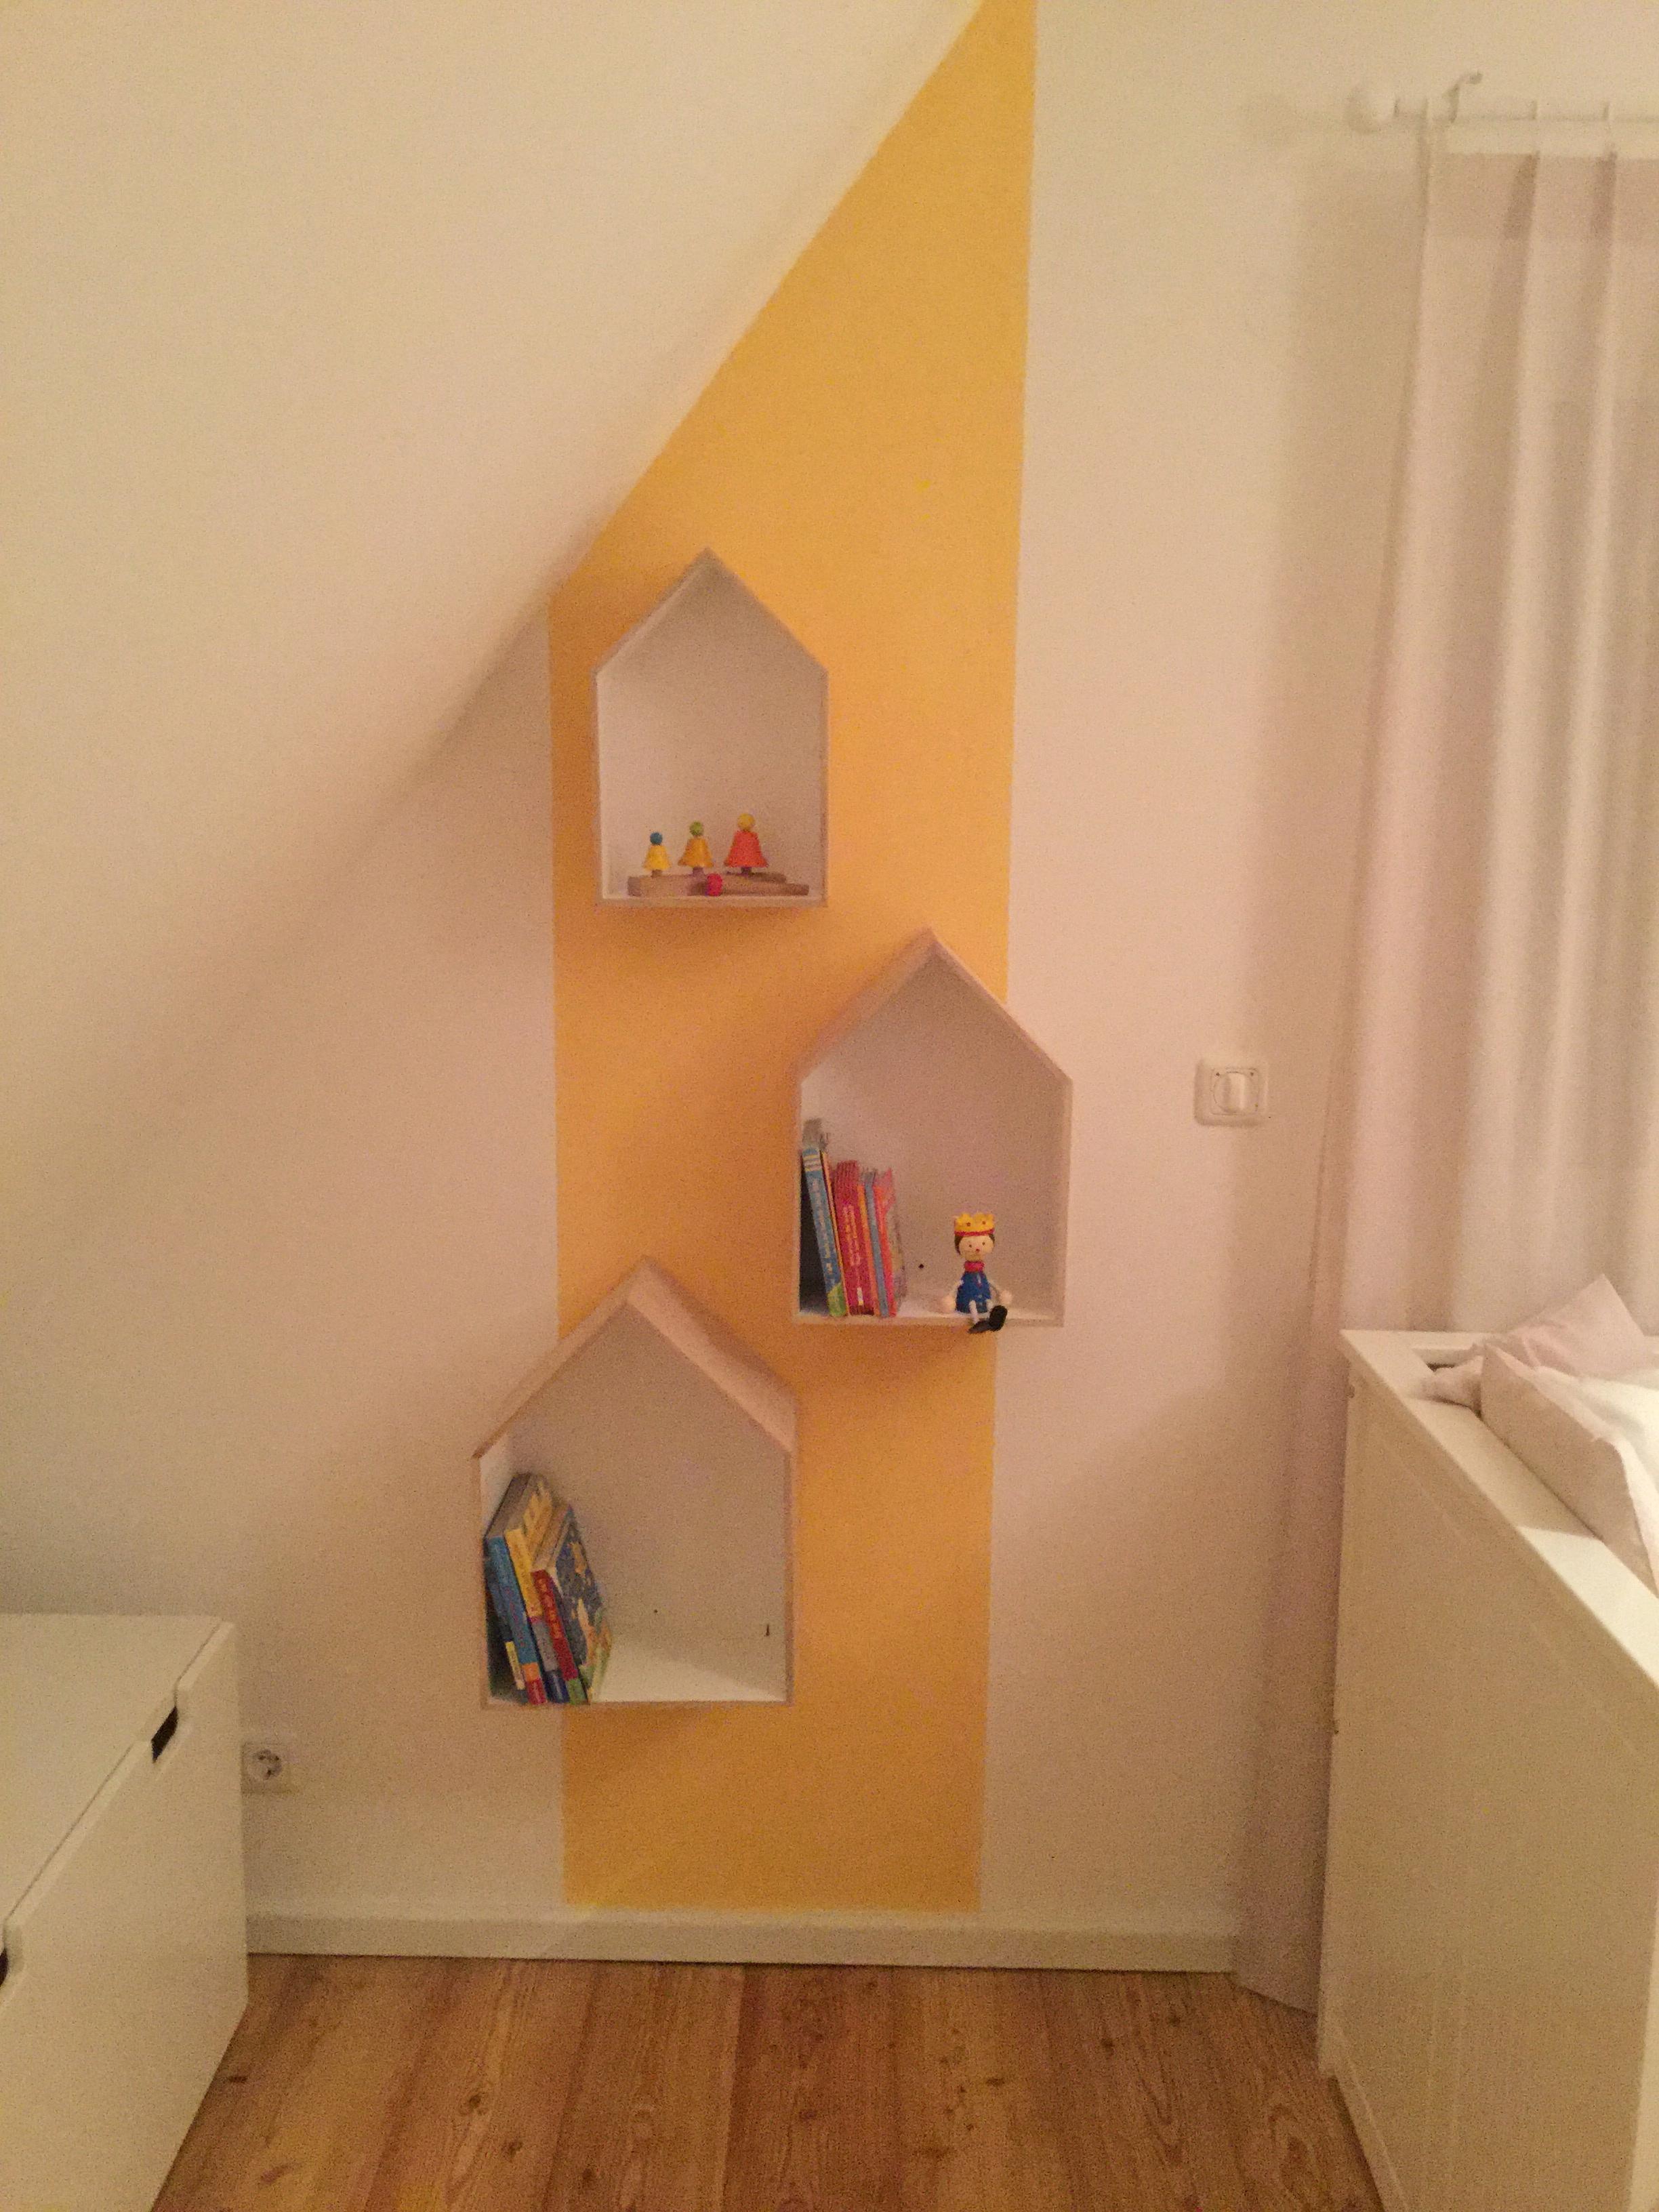 gelbe wand bilder ideen couchstyle. Black Bedroom Furniture Sets. Home Design Ideas